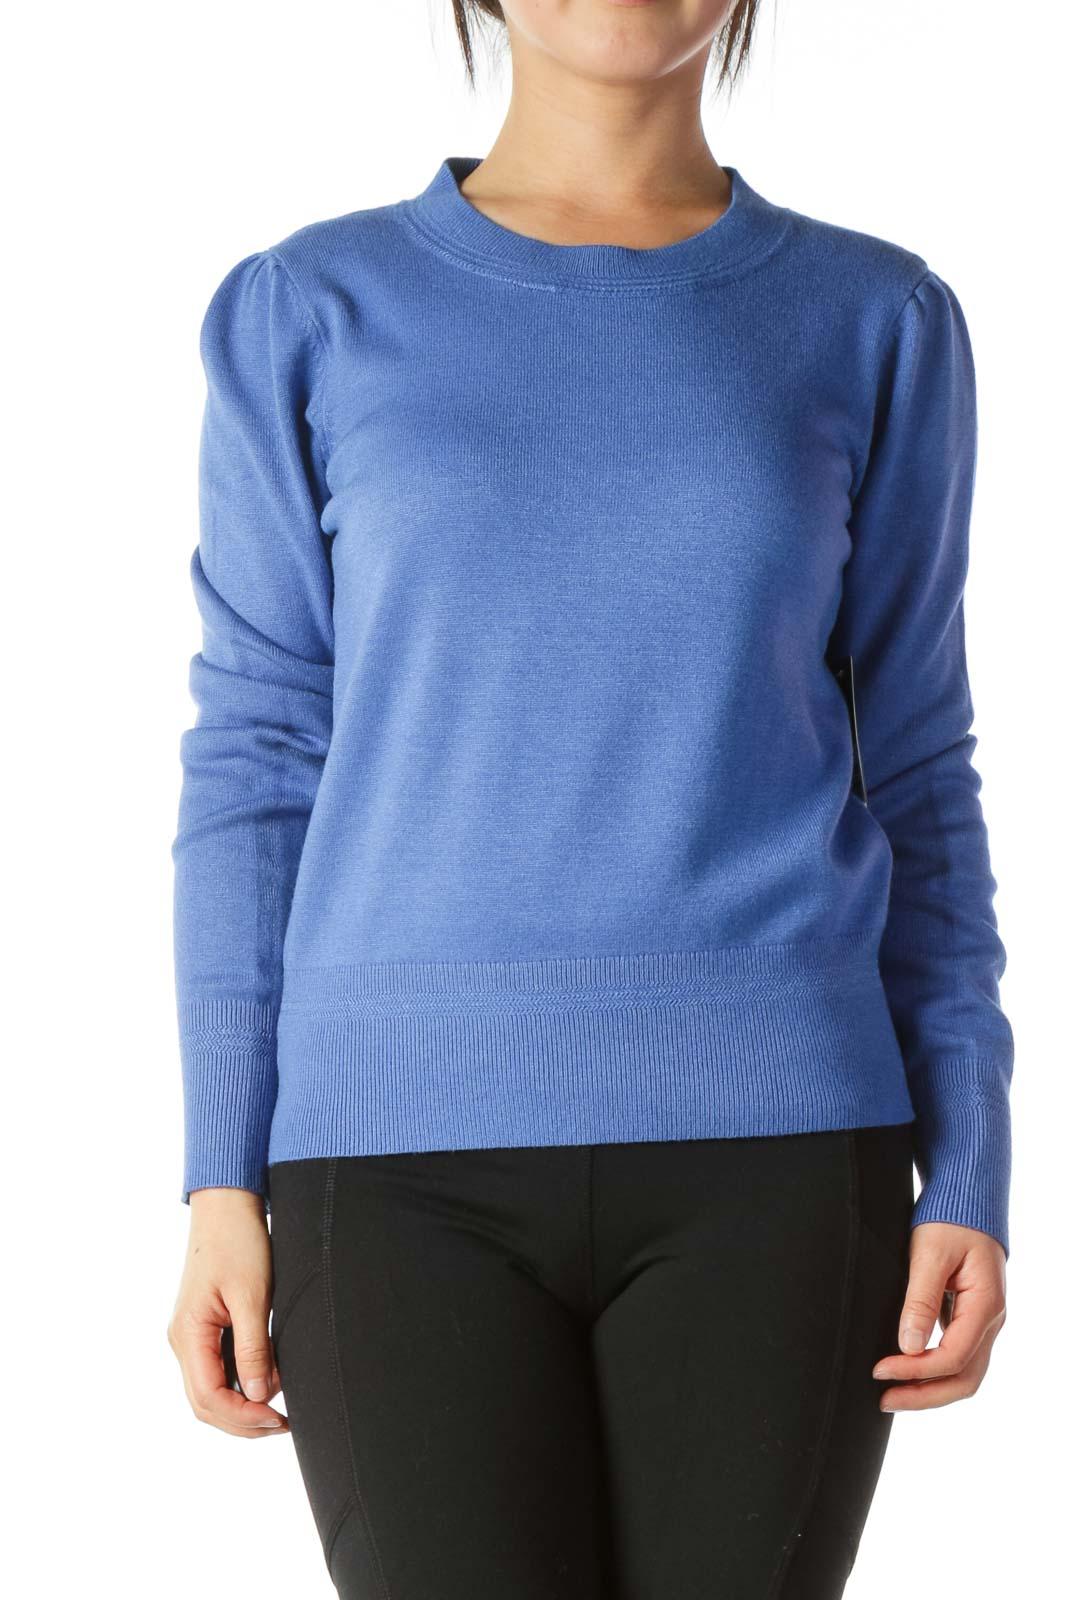 Blue Round-Neck Scrunched-Shoulder Detail Soft Sweater Front